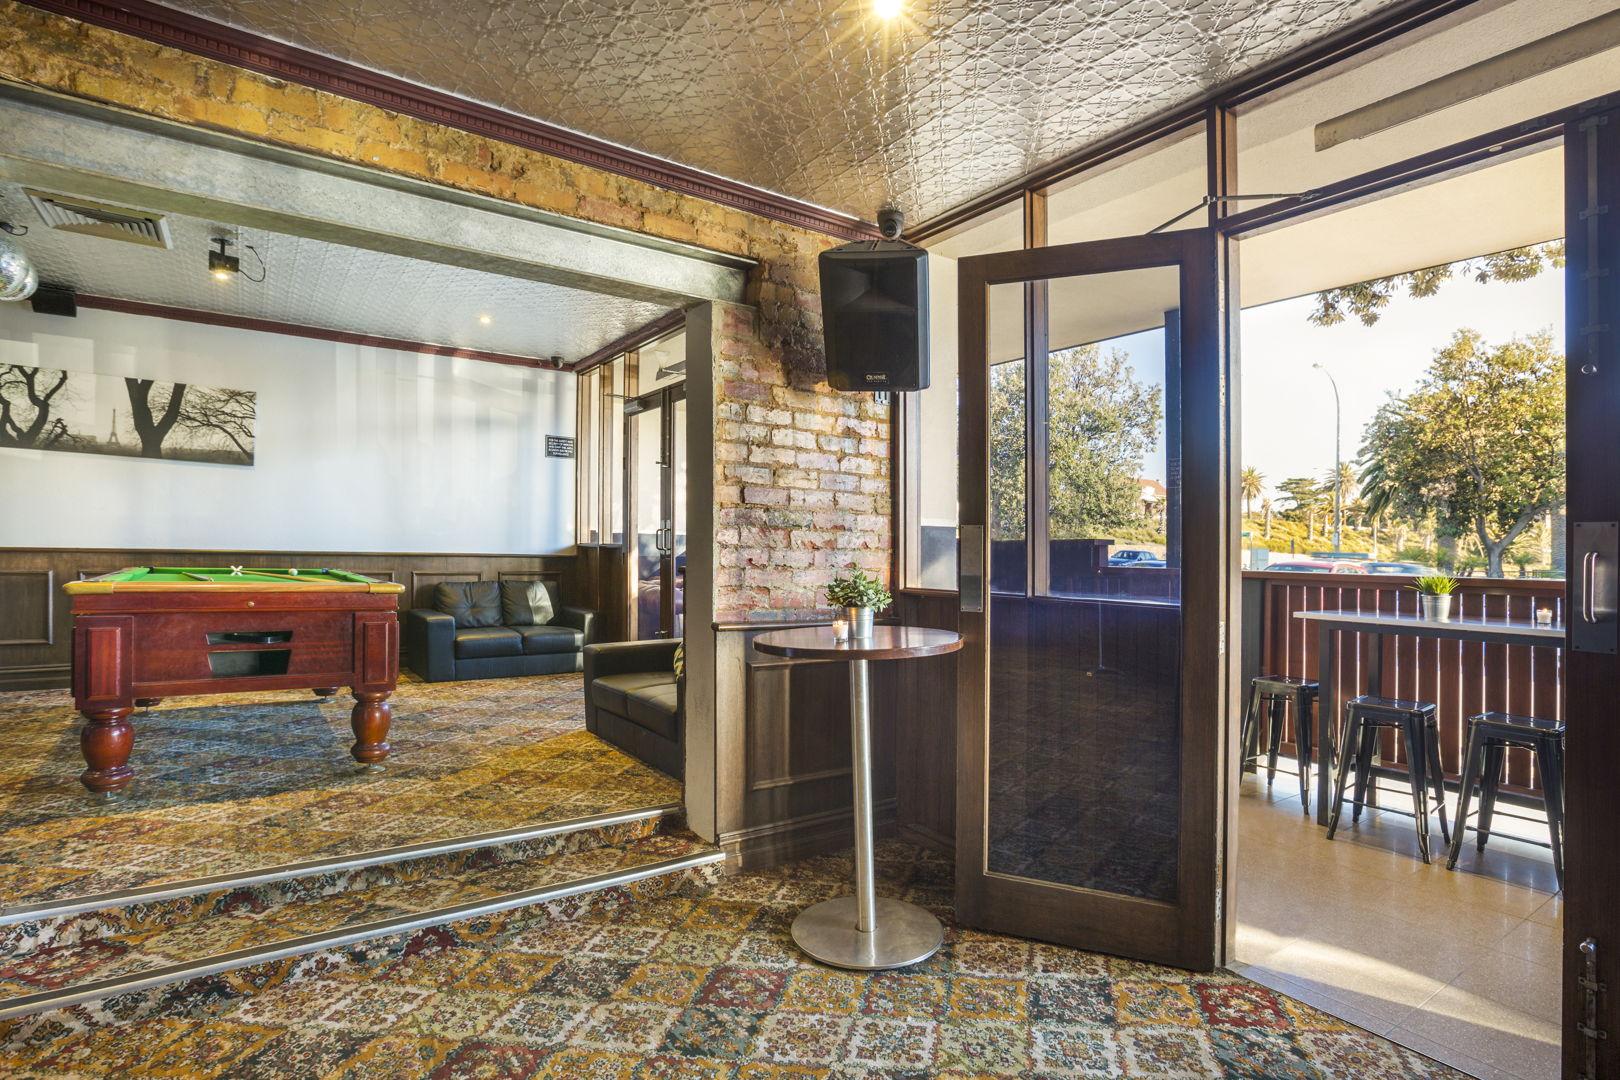 pier-hotel-flanagans-irish-bar (3).jpg